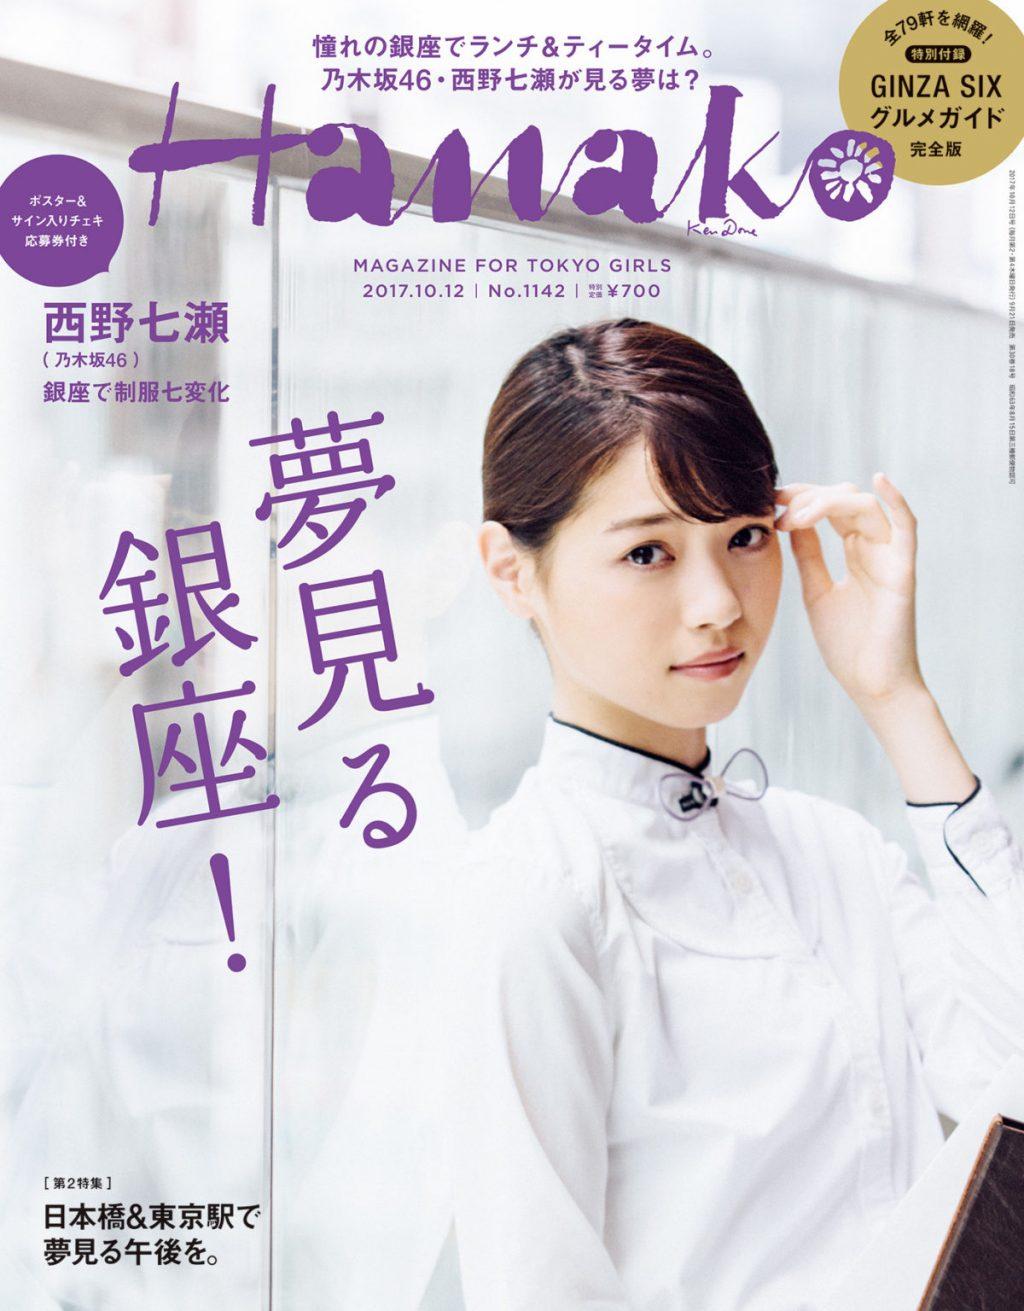 <span>No. 1142<br> 西野七瀬、銀座で制服七変化</span>夢見る銀座!